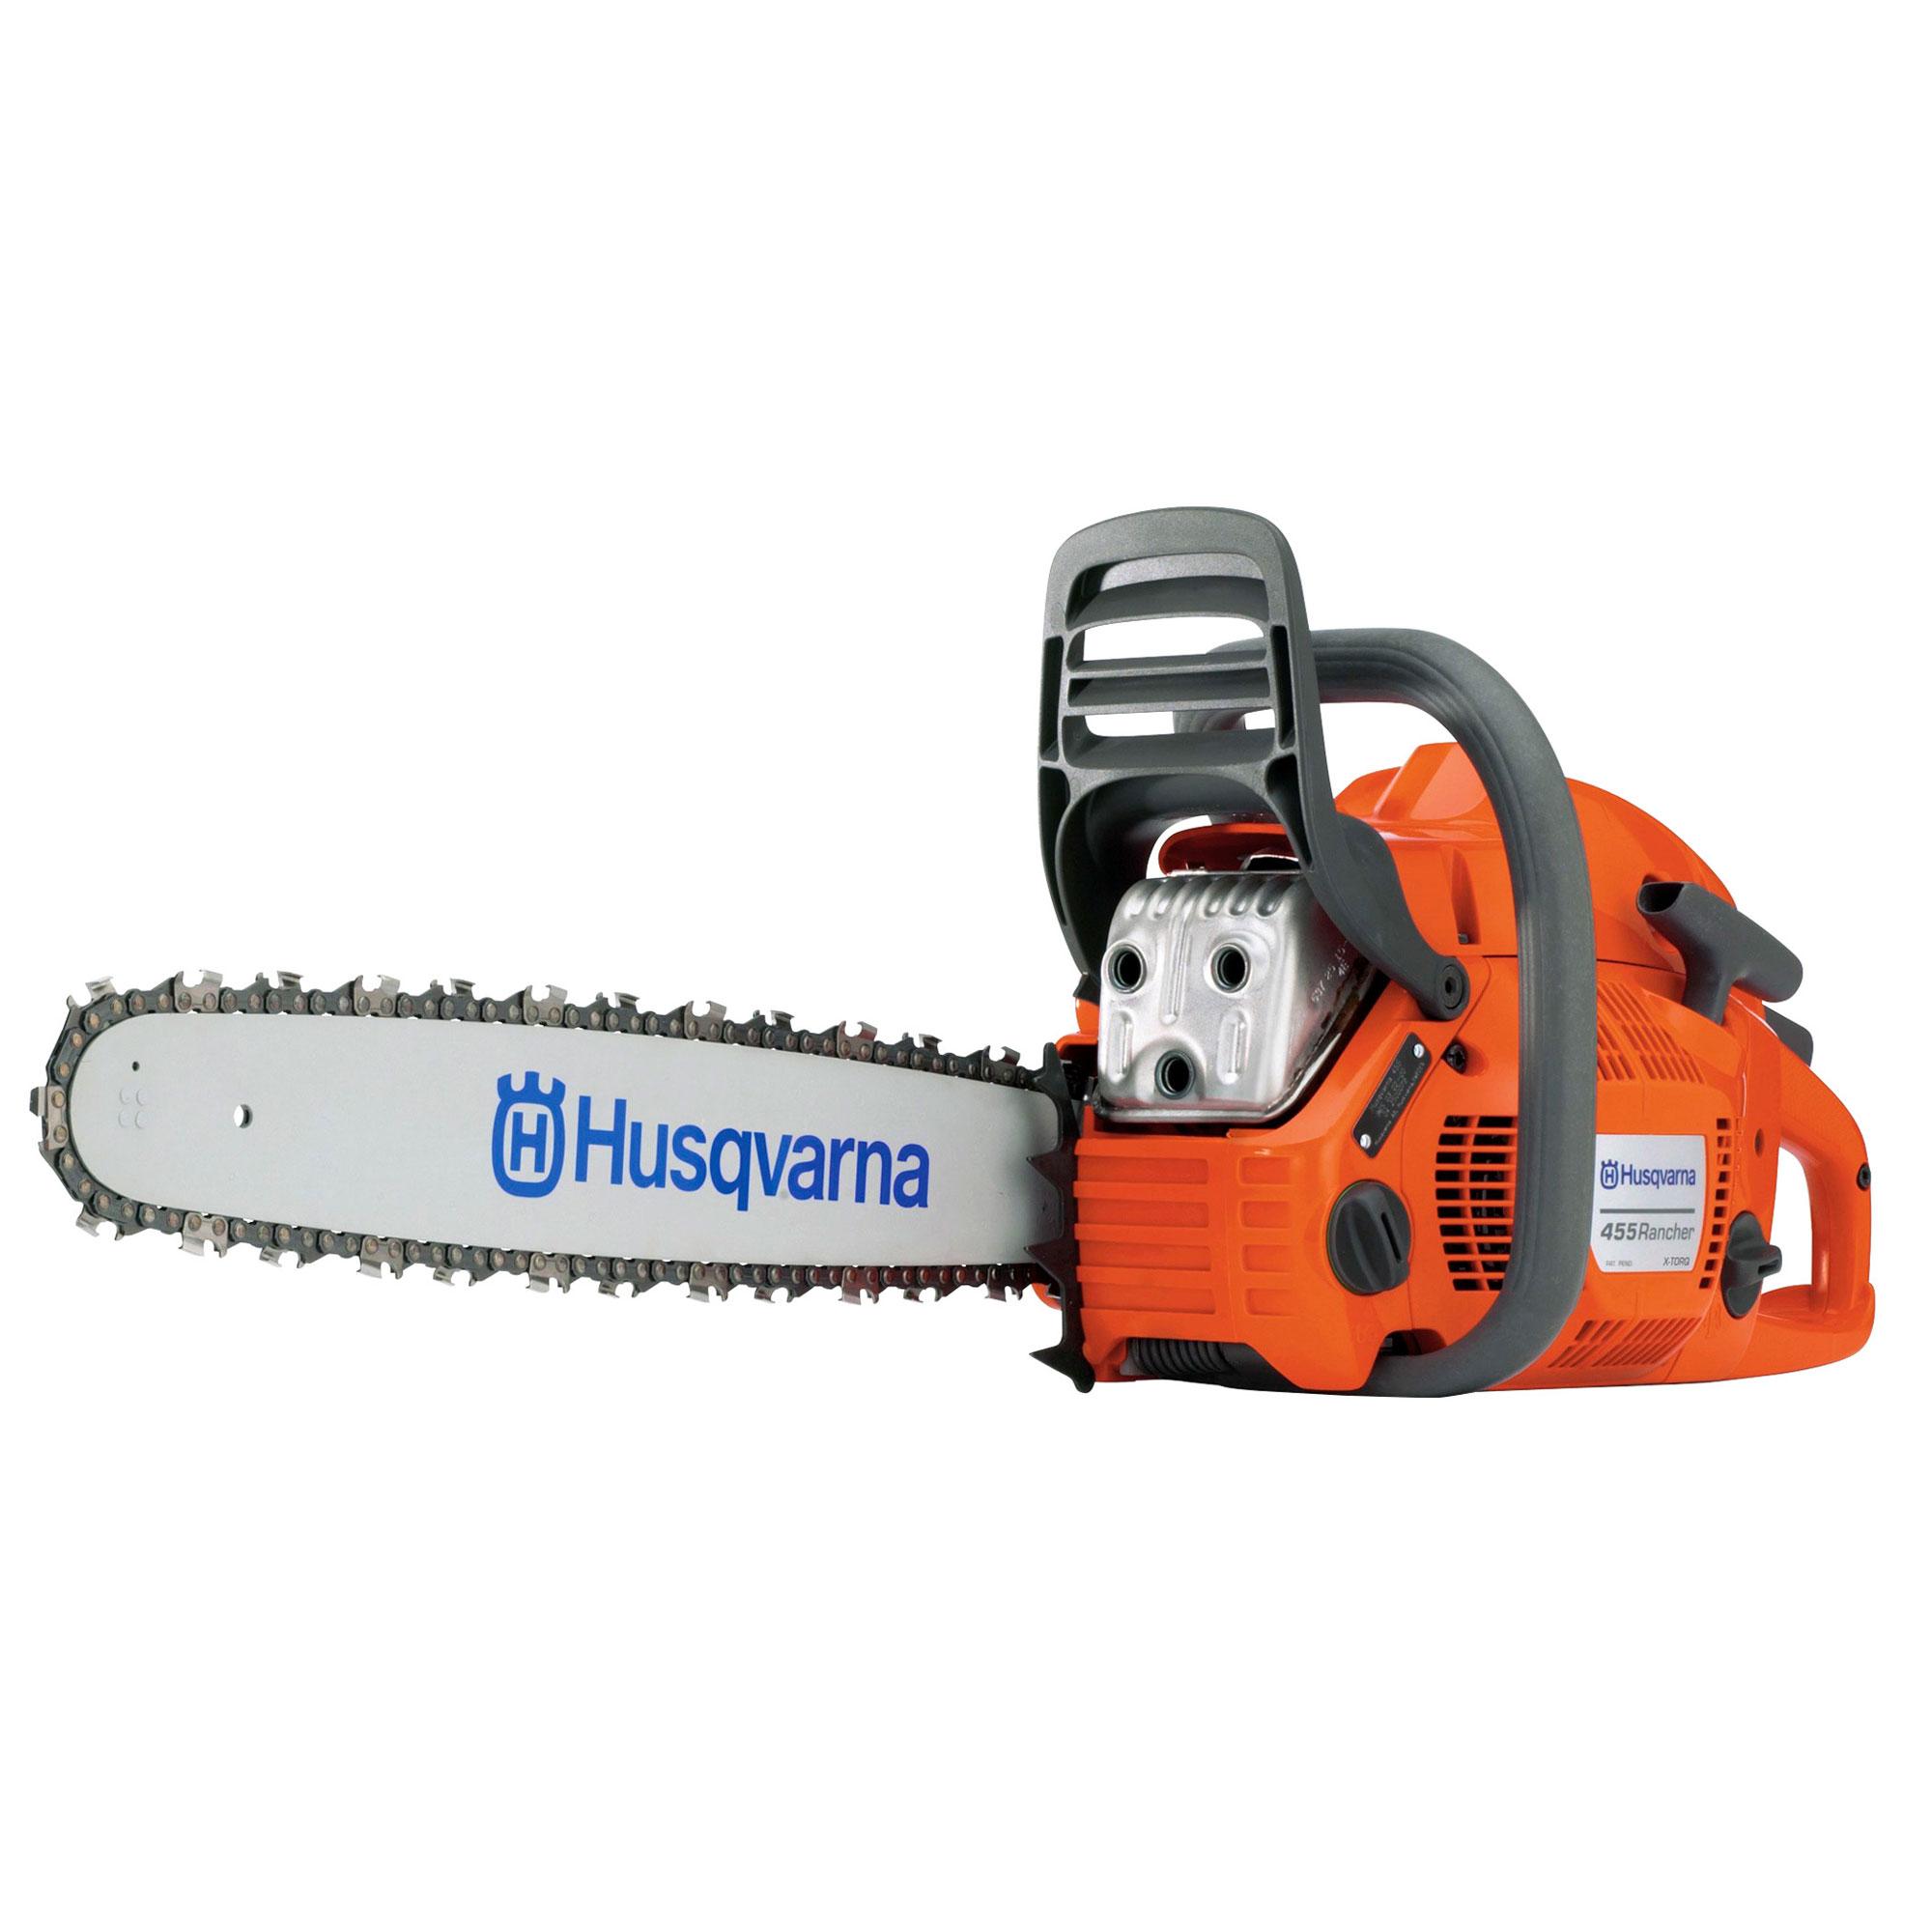 Husqvarna 455 Rancher 55 5cc 18 Inch 3/8 Pitch 3 49 HP Gas Chainsaw, Orange